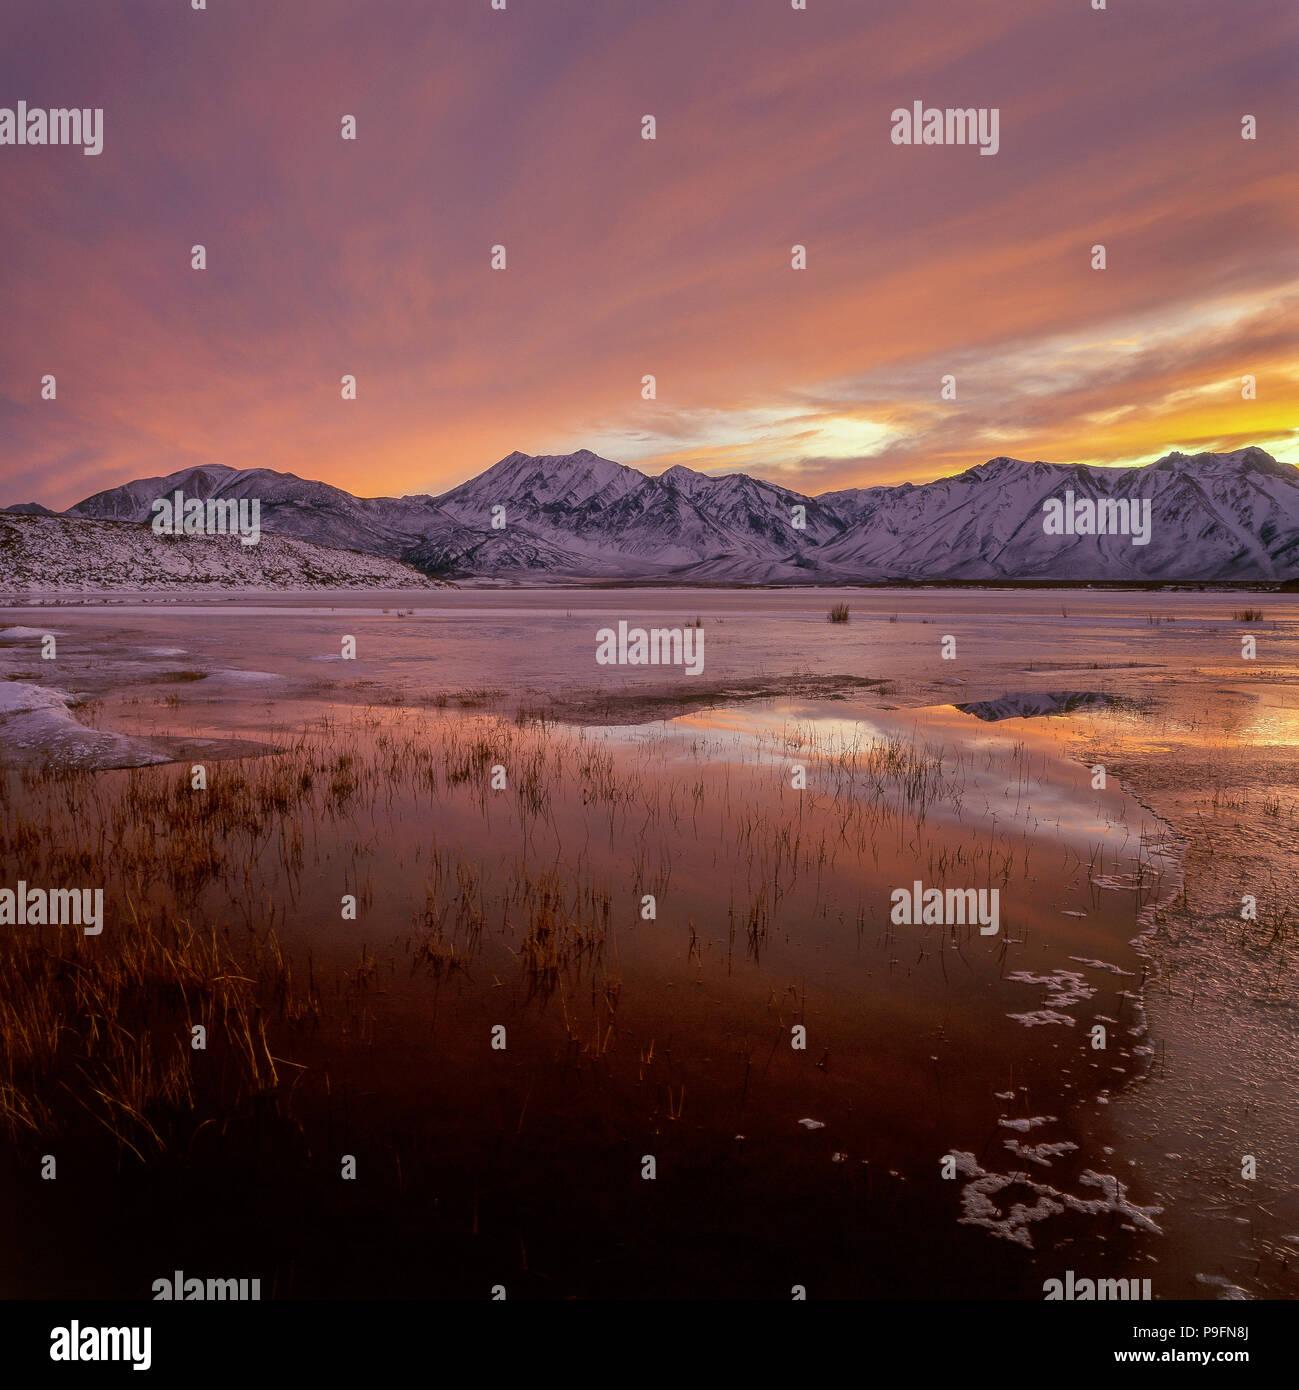 Sonnenuntergang, Crowley Lake, Mount Morgan, Roter Berg, Inyo National Forest, östlichen Sierra, Kalifornien Stockbild